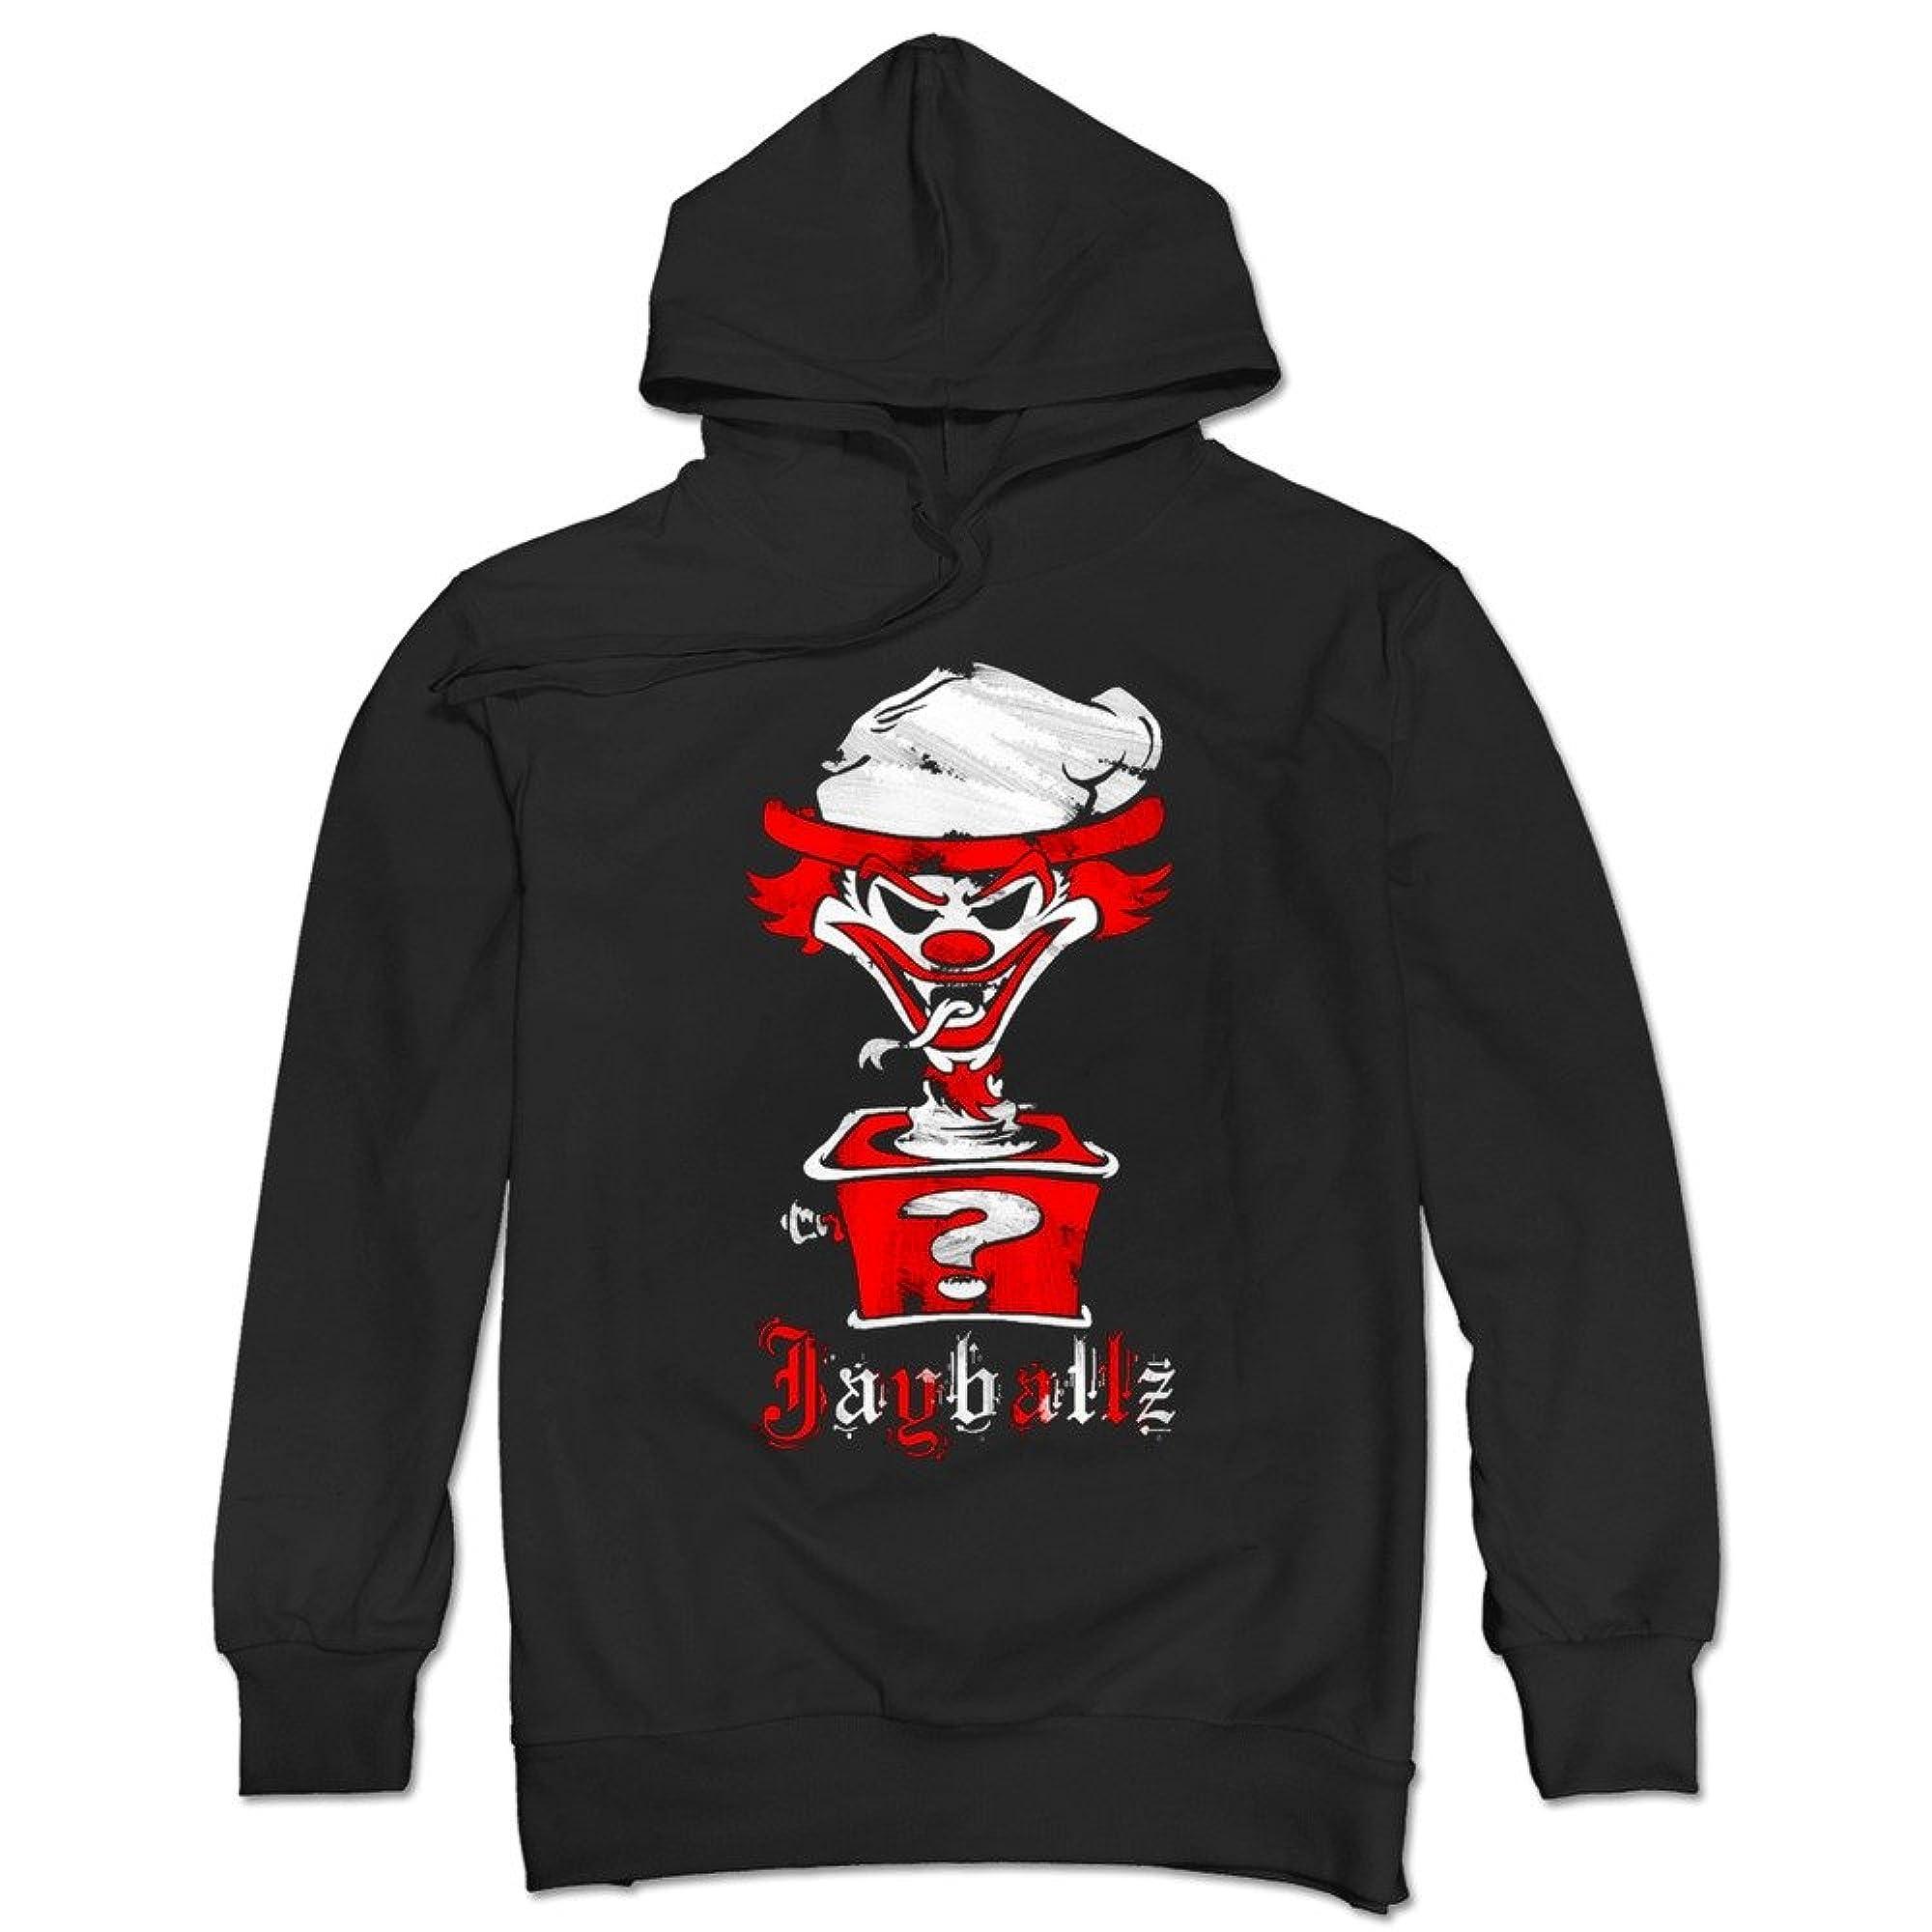 Pinktee S Hatchetman Icp Hatchet Man Symbol Hats Shirts